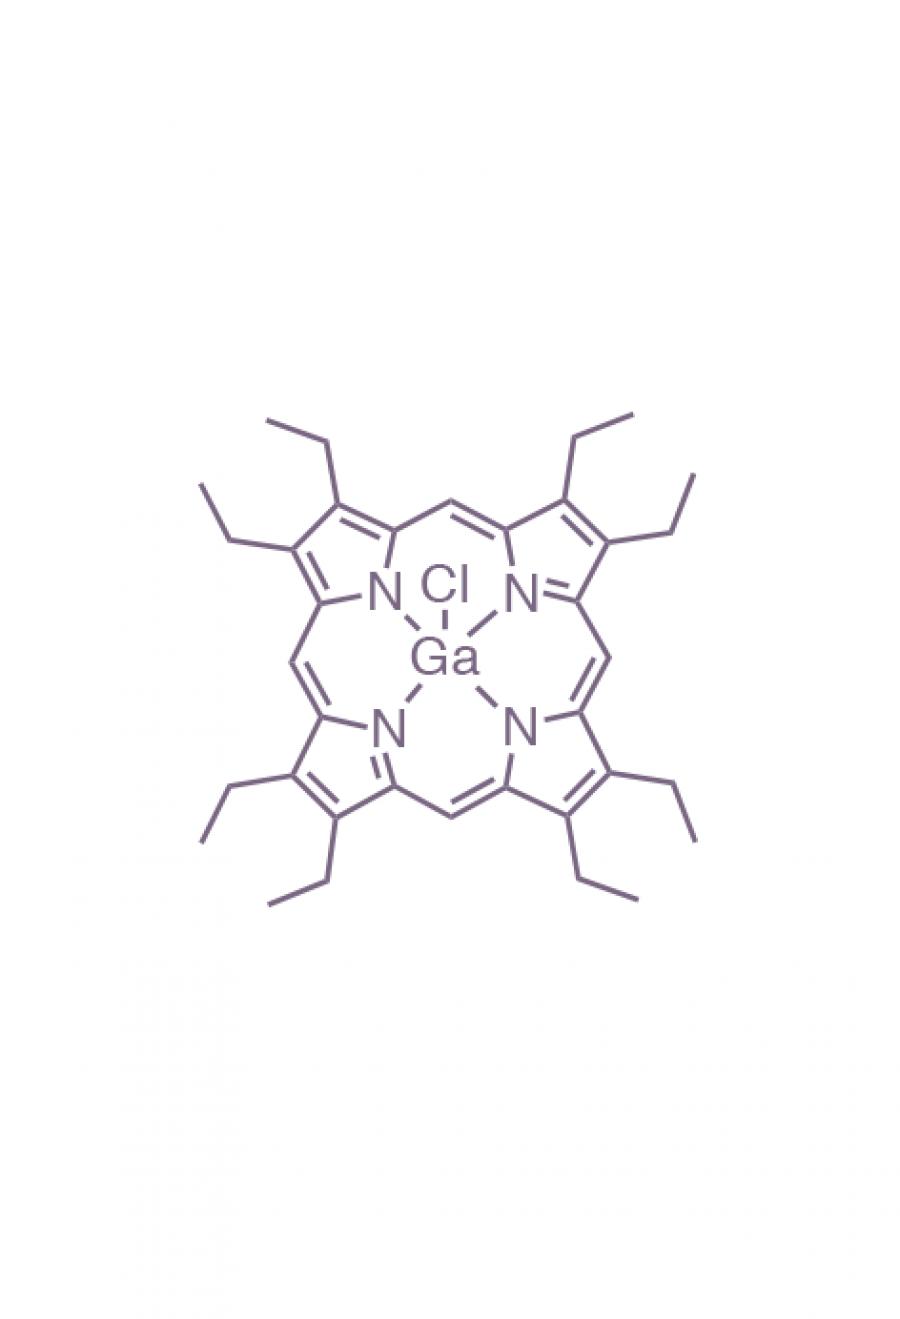 gallium(III) 2,3,7,8,12,13,17,18-(octaethyl)porphyrin chloride